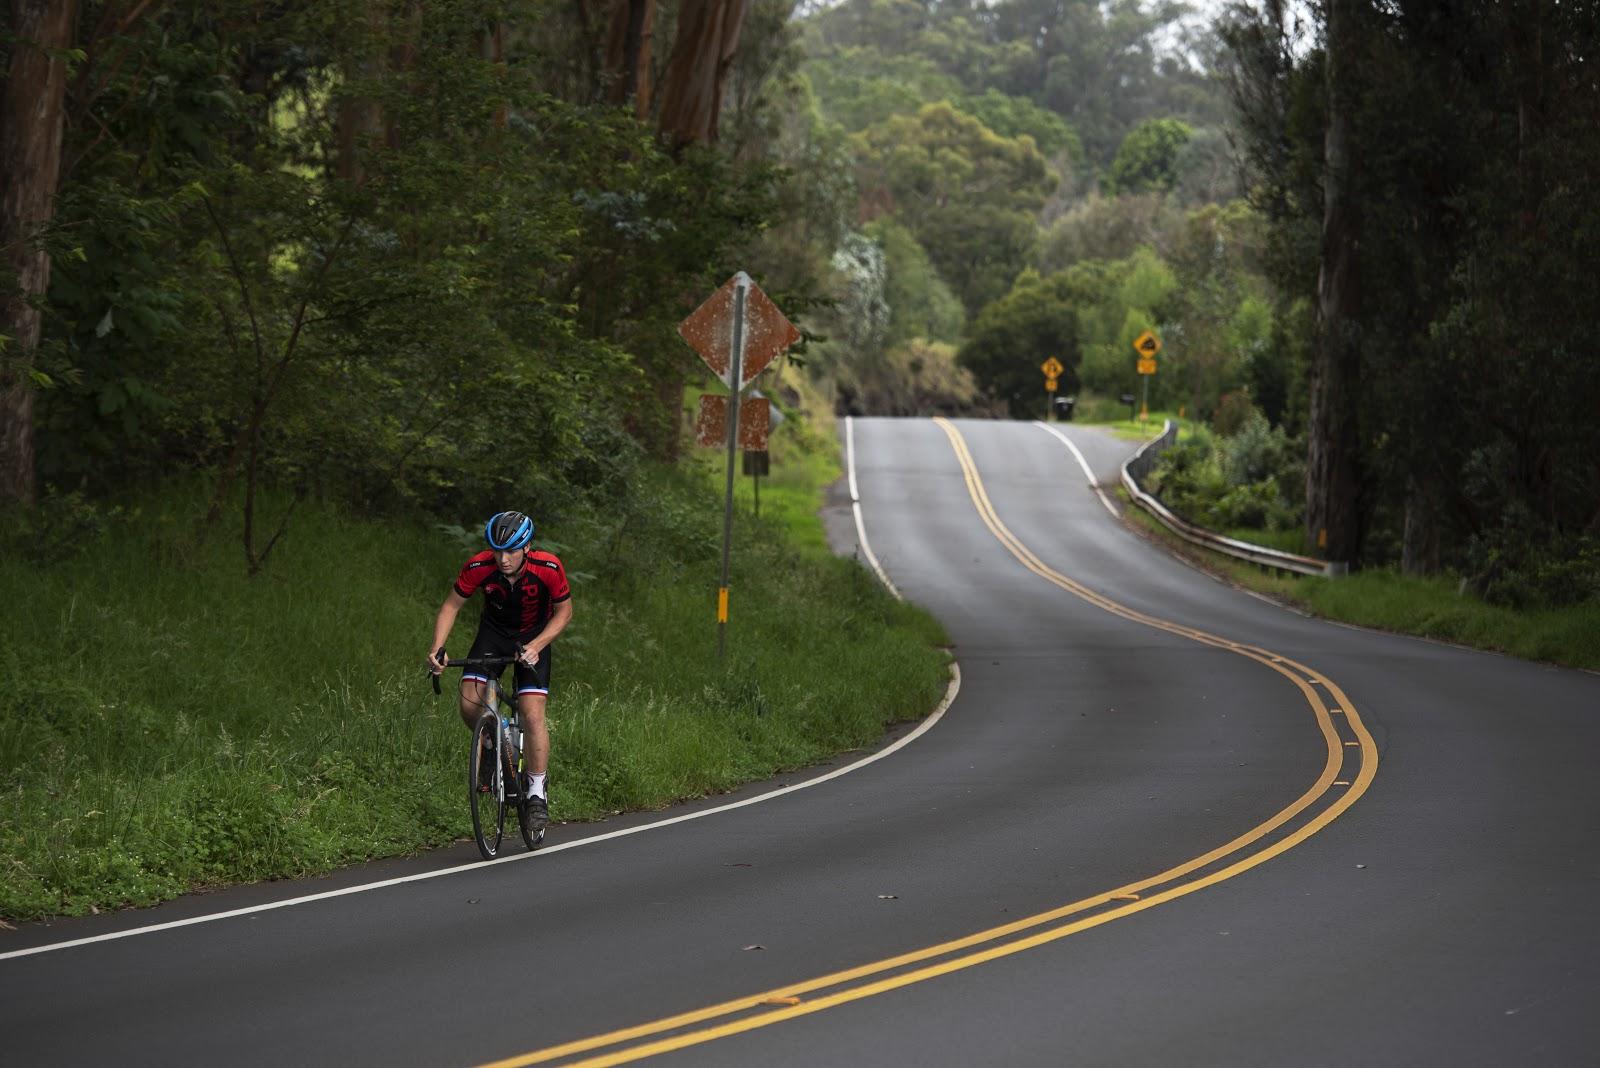 Riding by bike past the Haleakala park sign